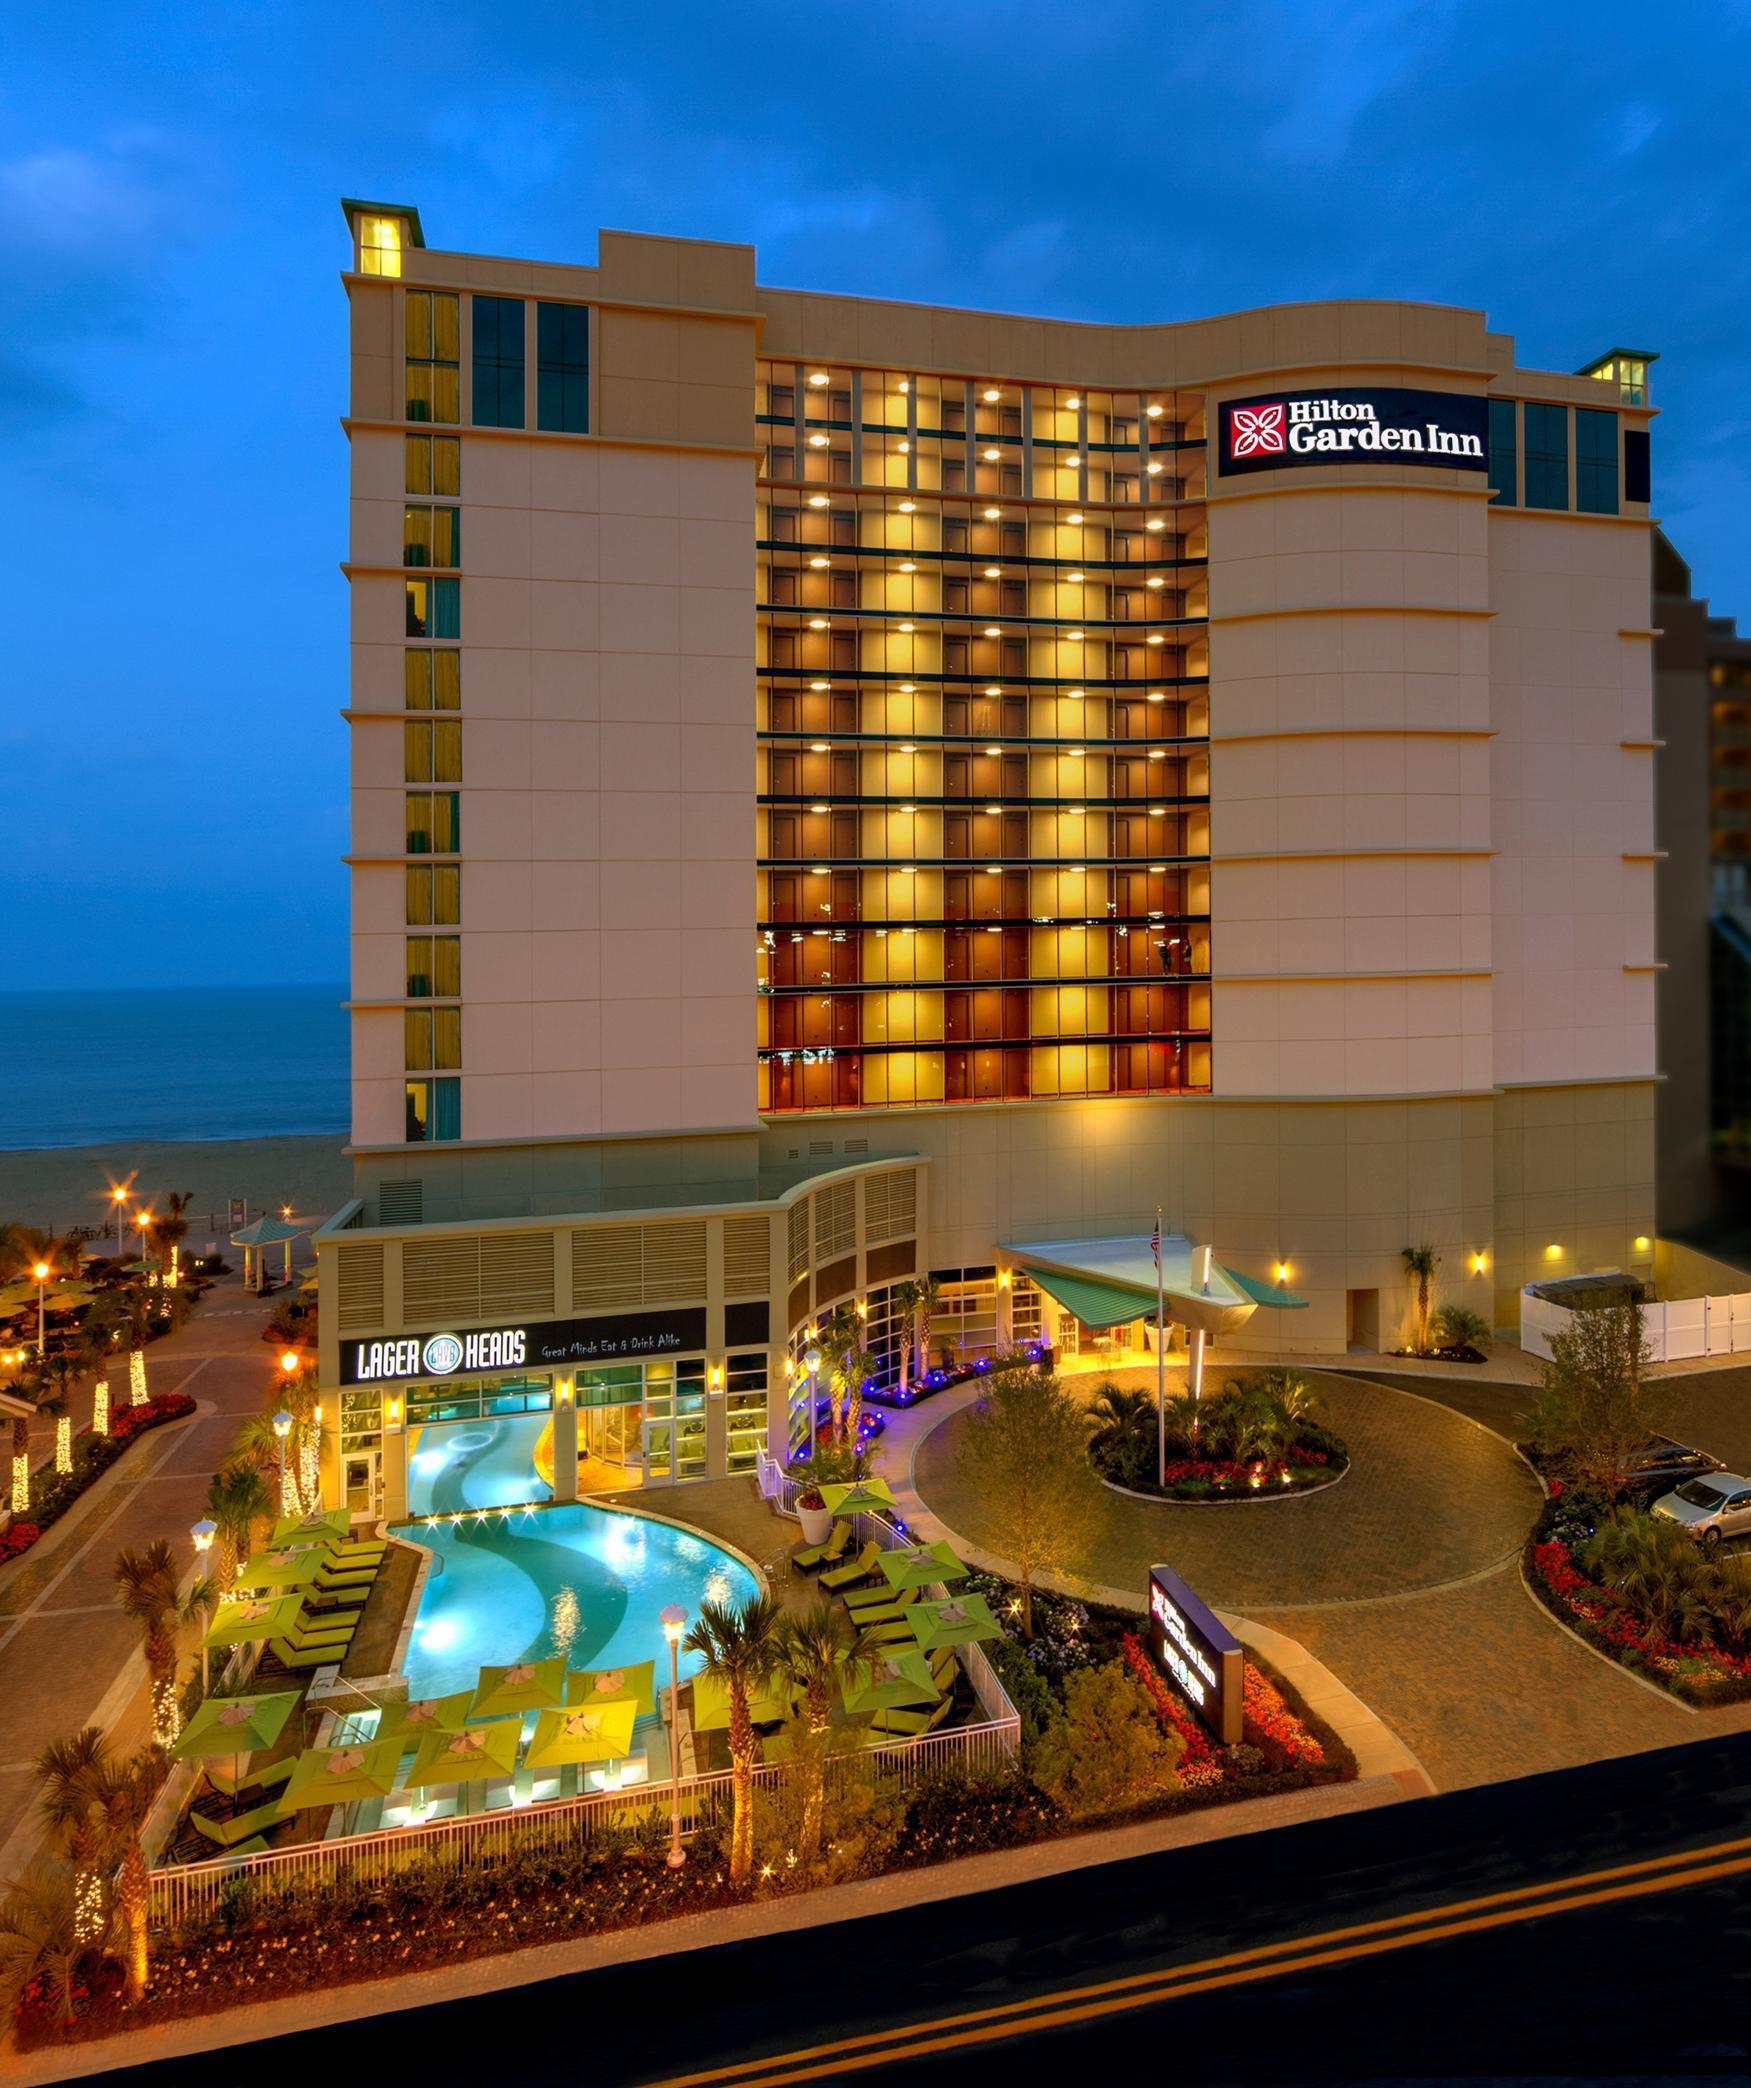 Hilton Garden Inn Virginia Beach Oceanfront 3315 Atlantic Avenue ...